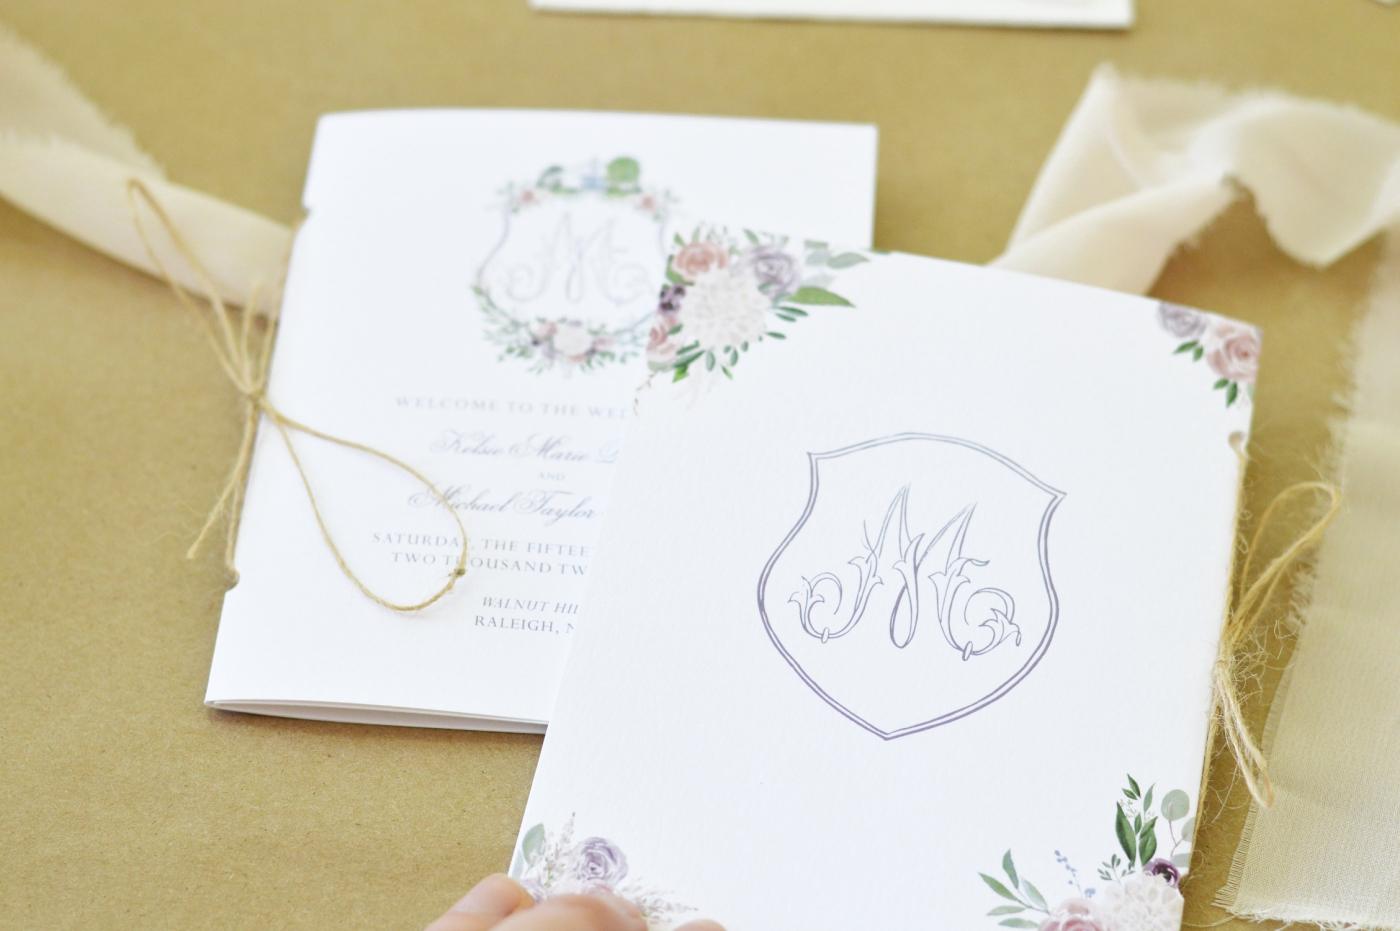 wedding-at-walnut-hill-in-Raleigh-Ashley-Triggiano-17